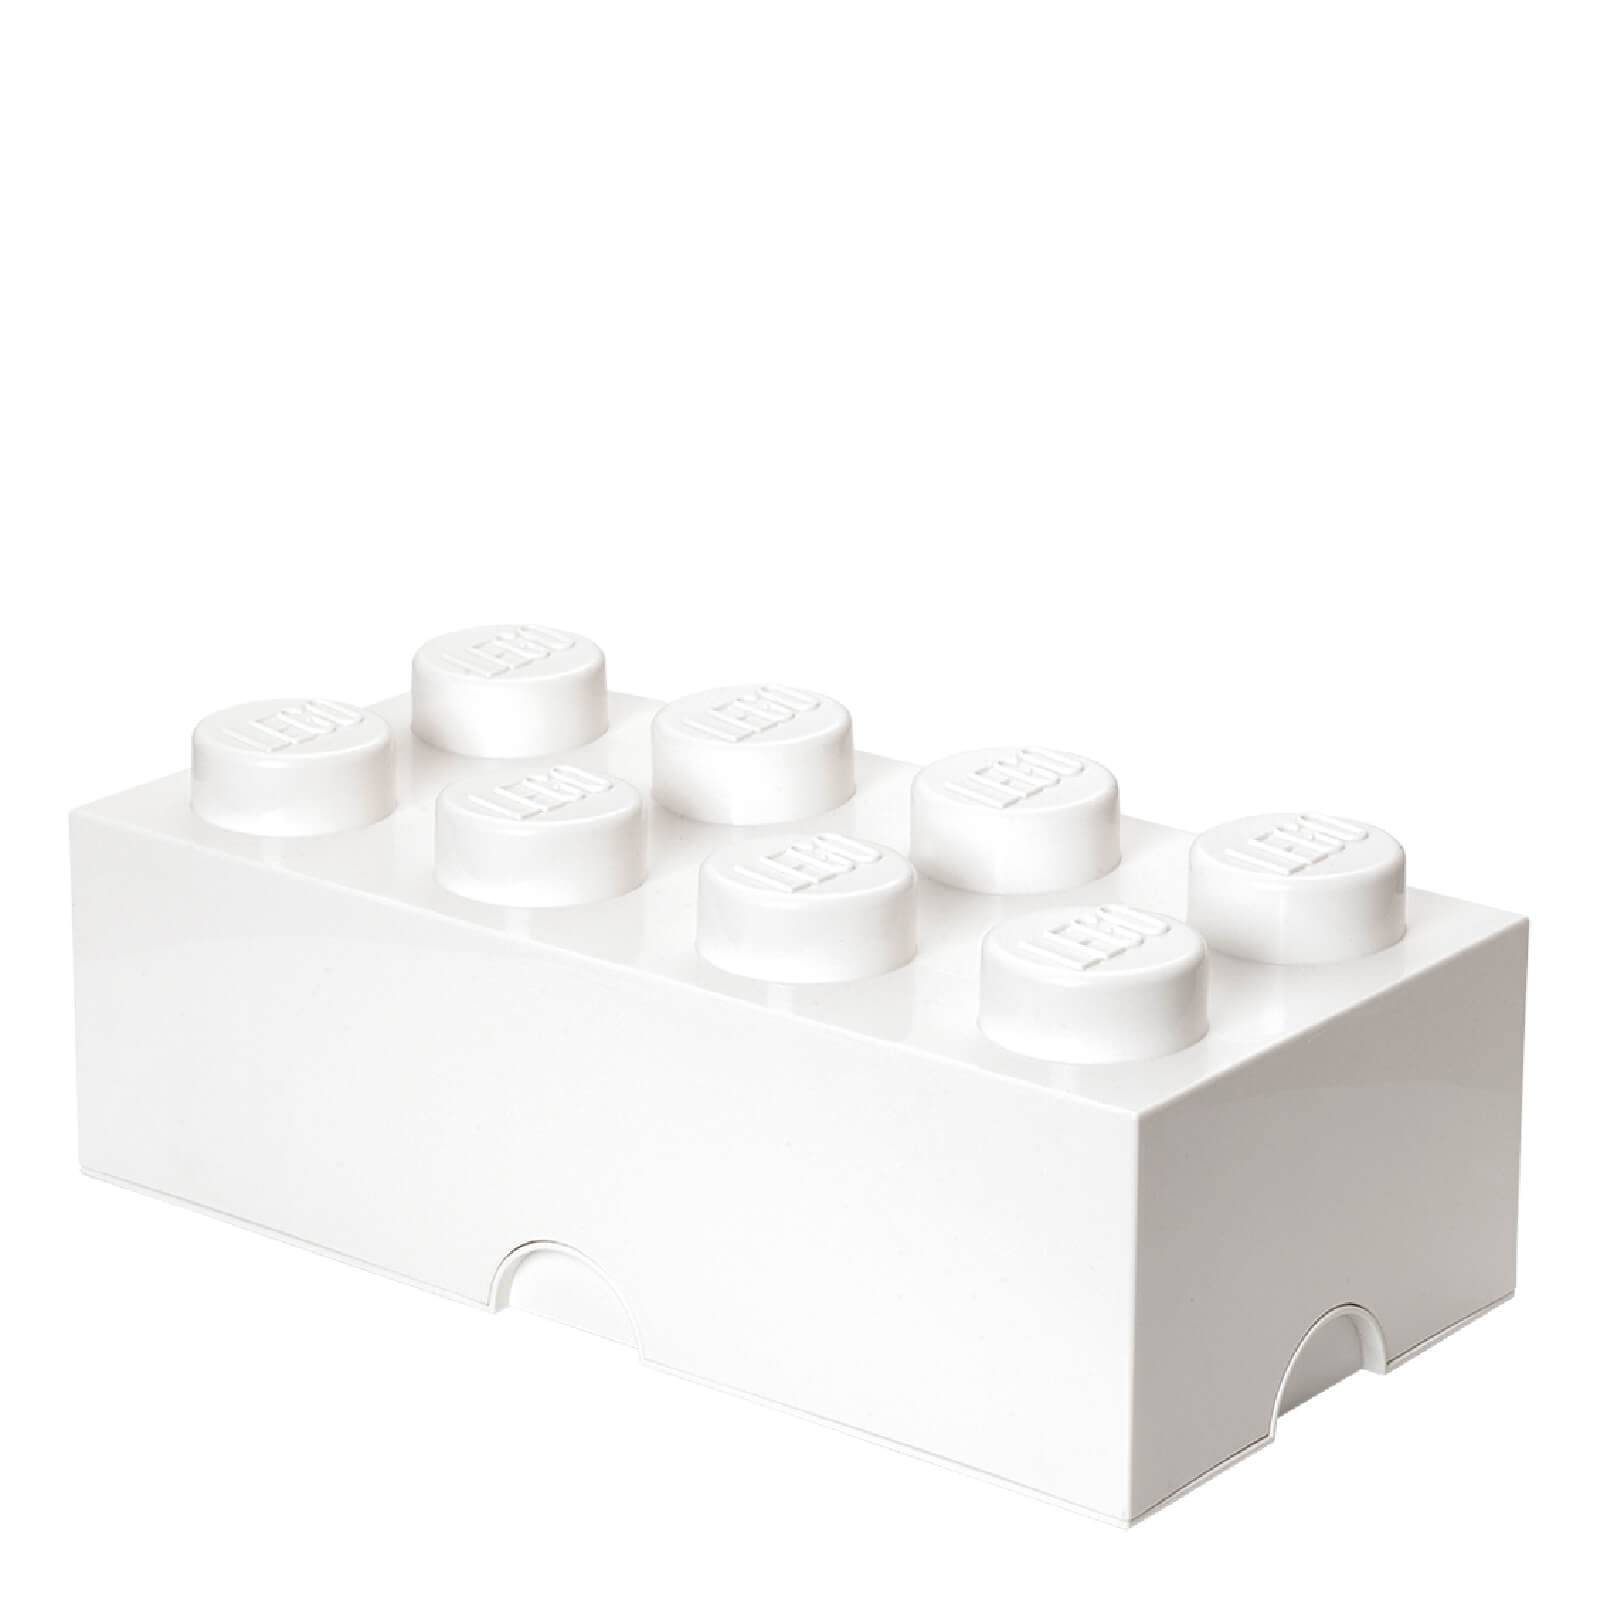 Lego Storage Brick 8 - White